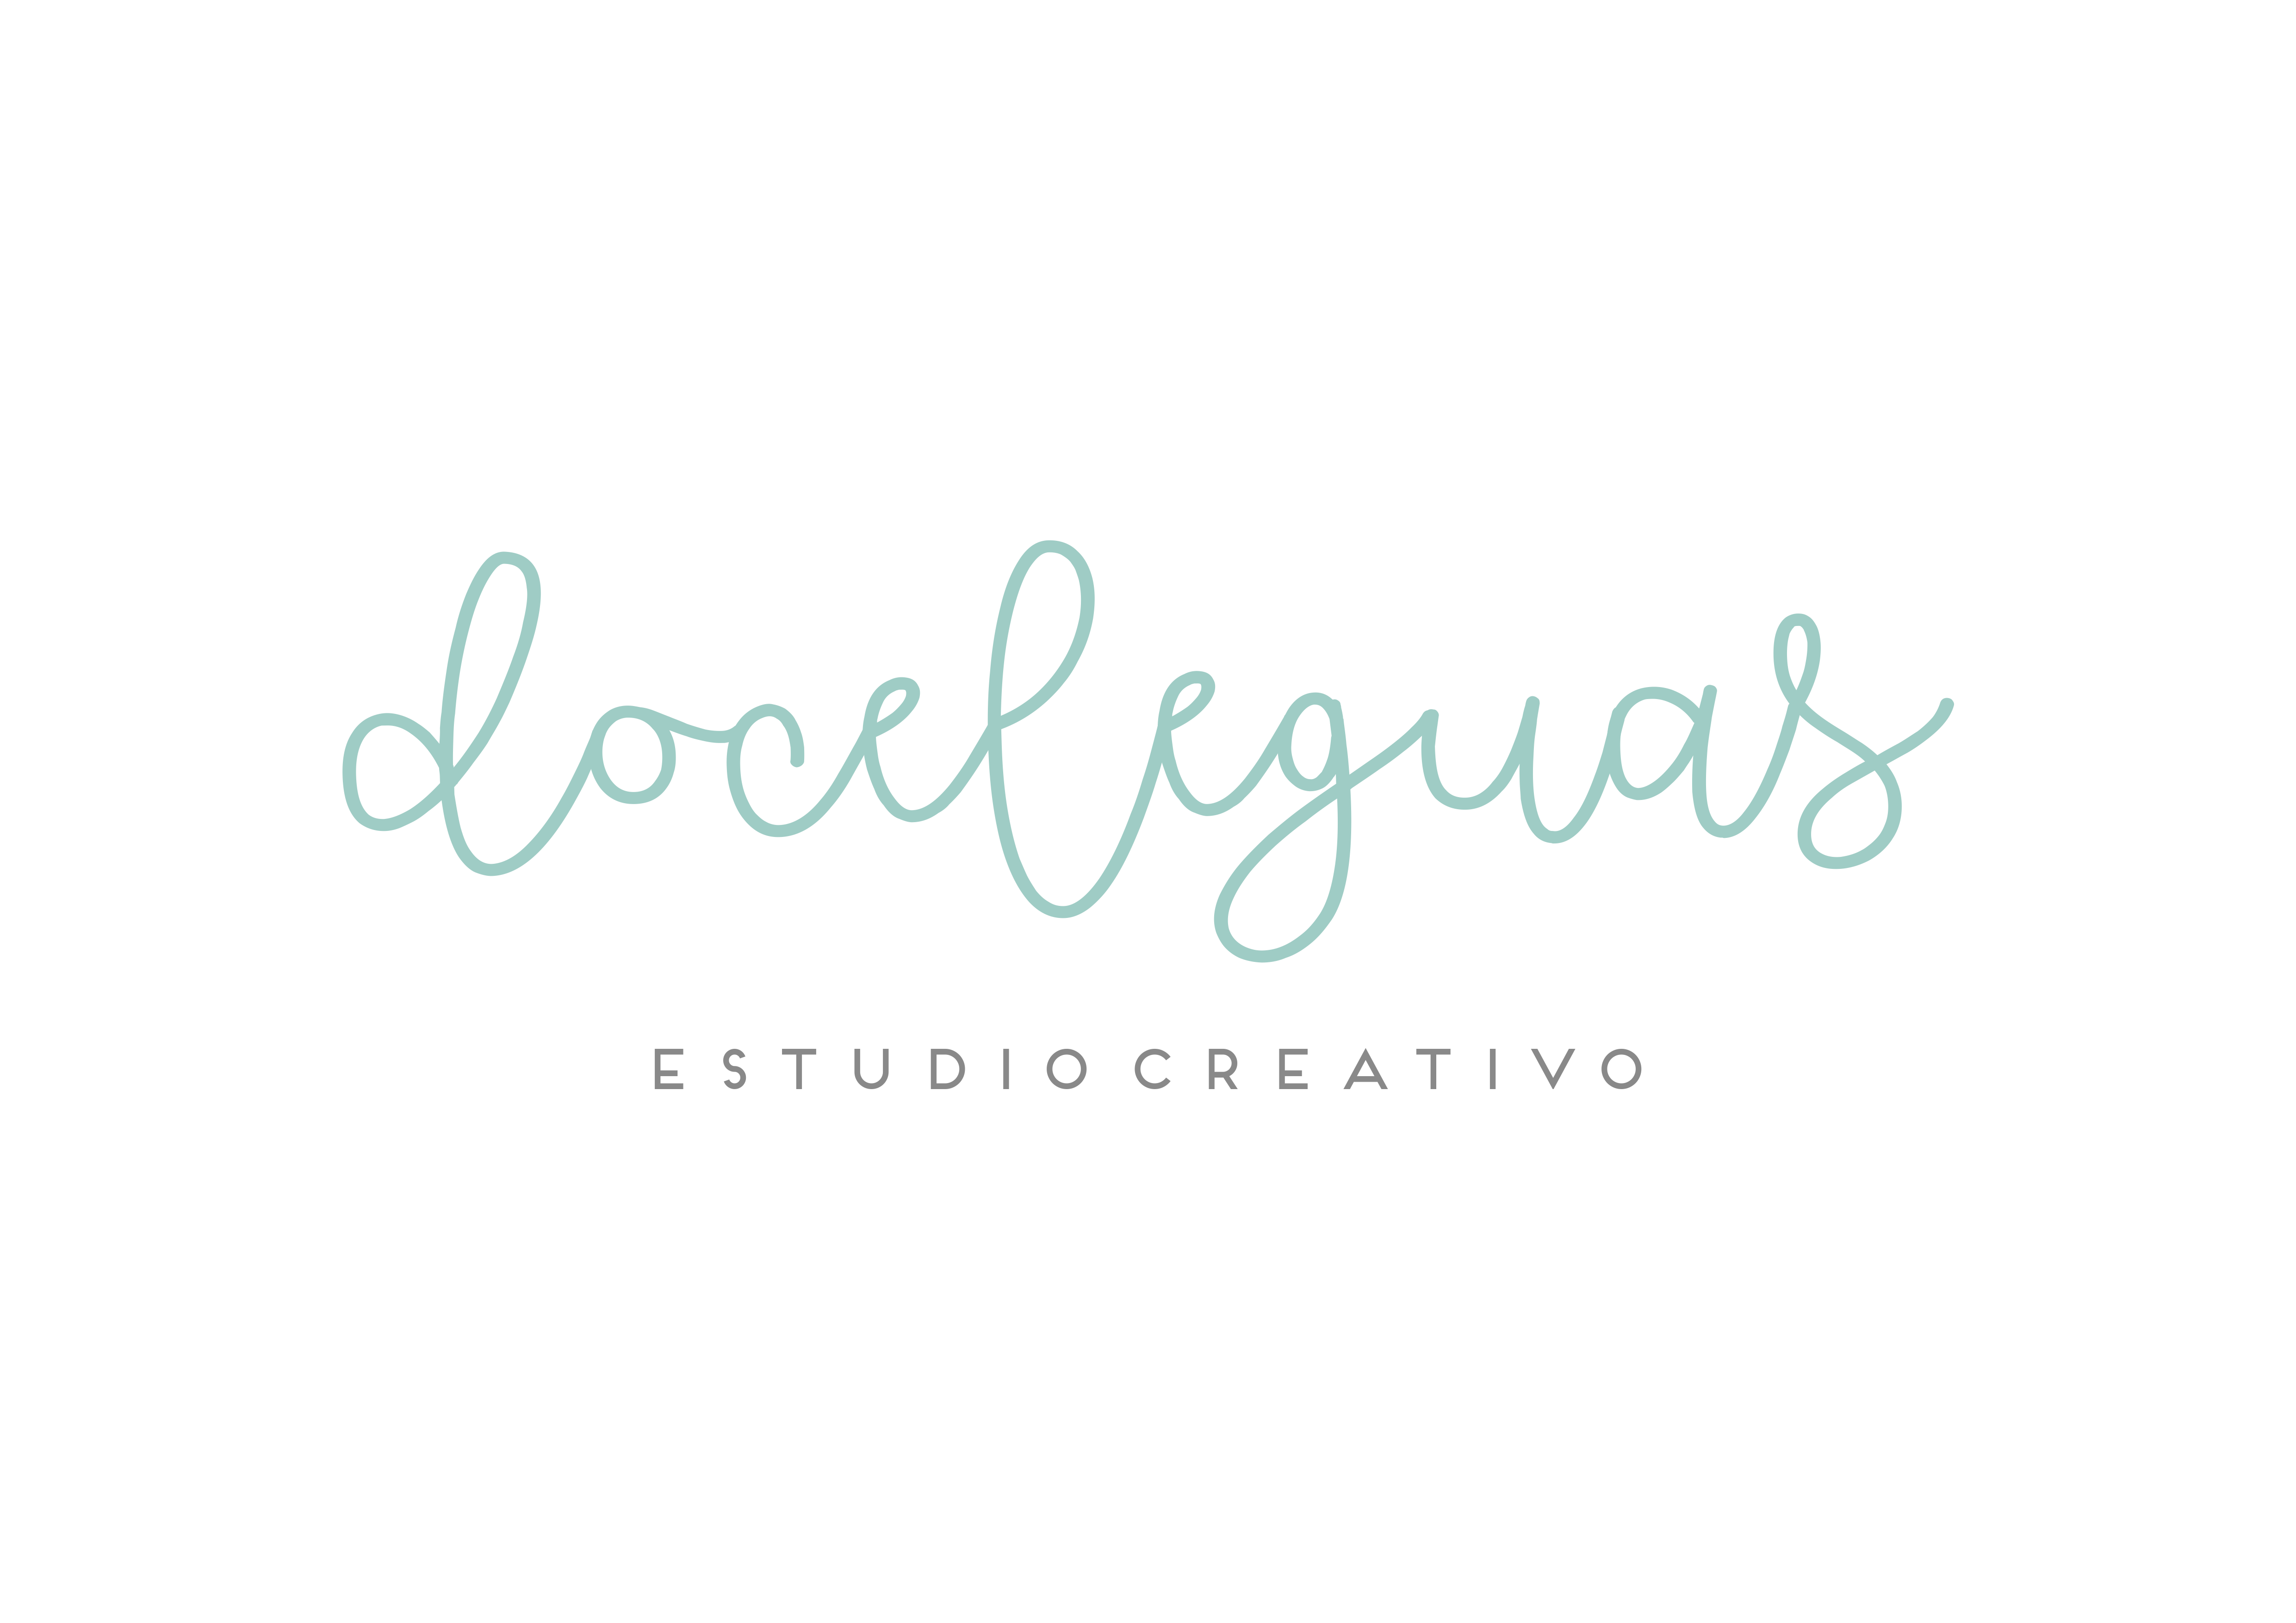 Doce Leguas | Estudio Creativo